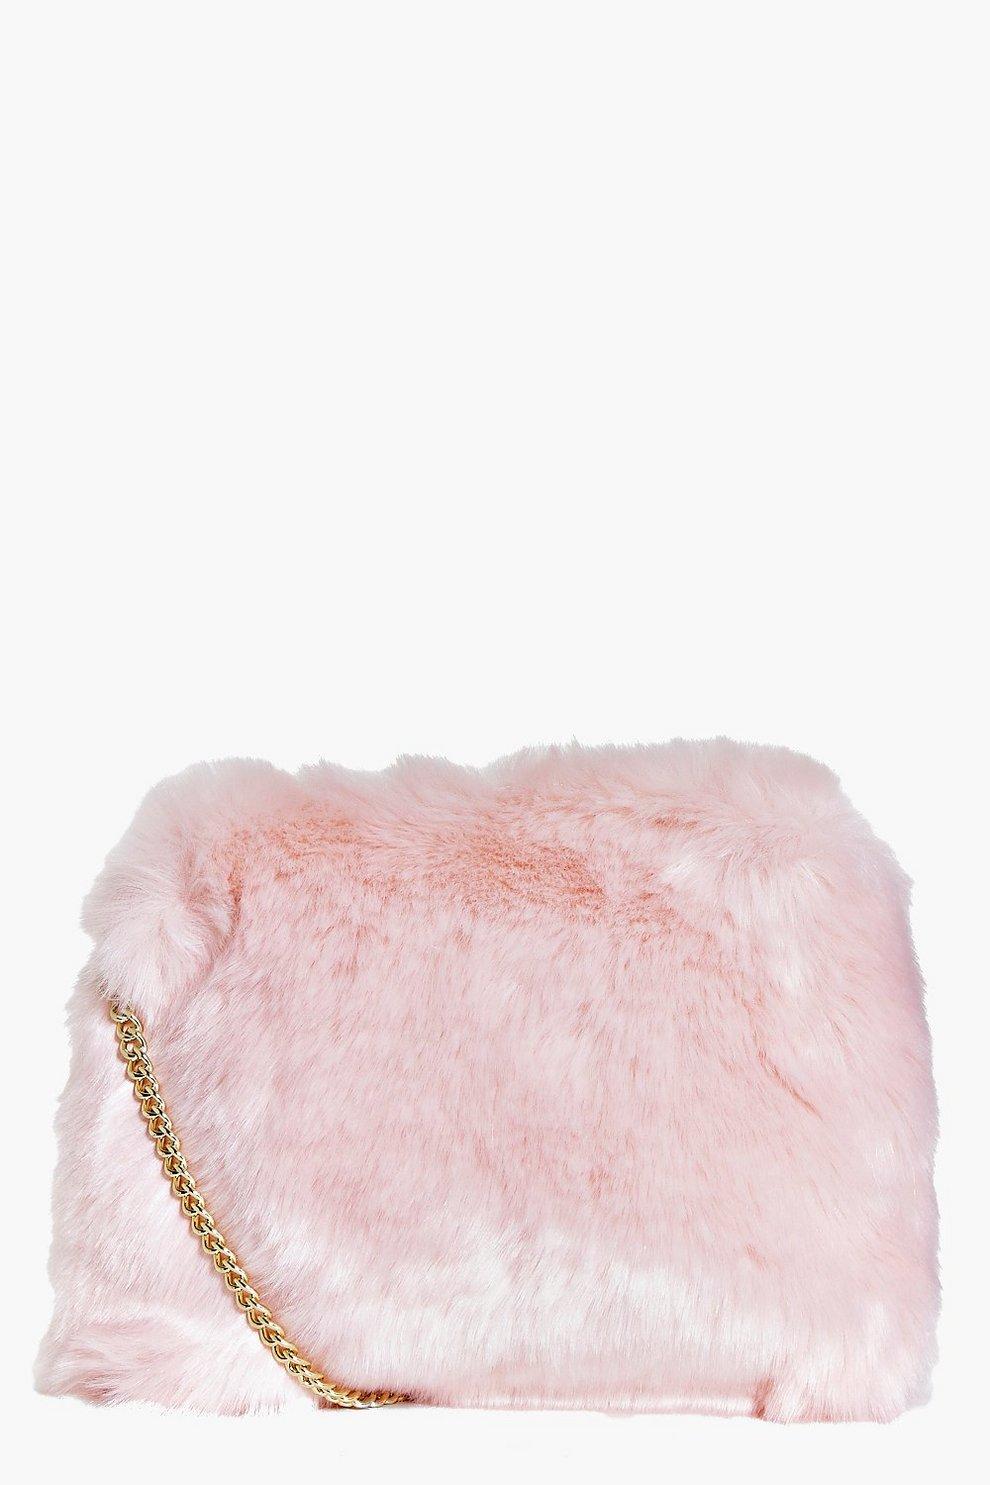 Kara Fluffy Faux Fur Cross Body Bag  347275cfcc482